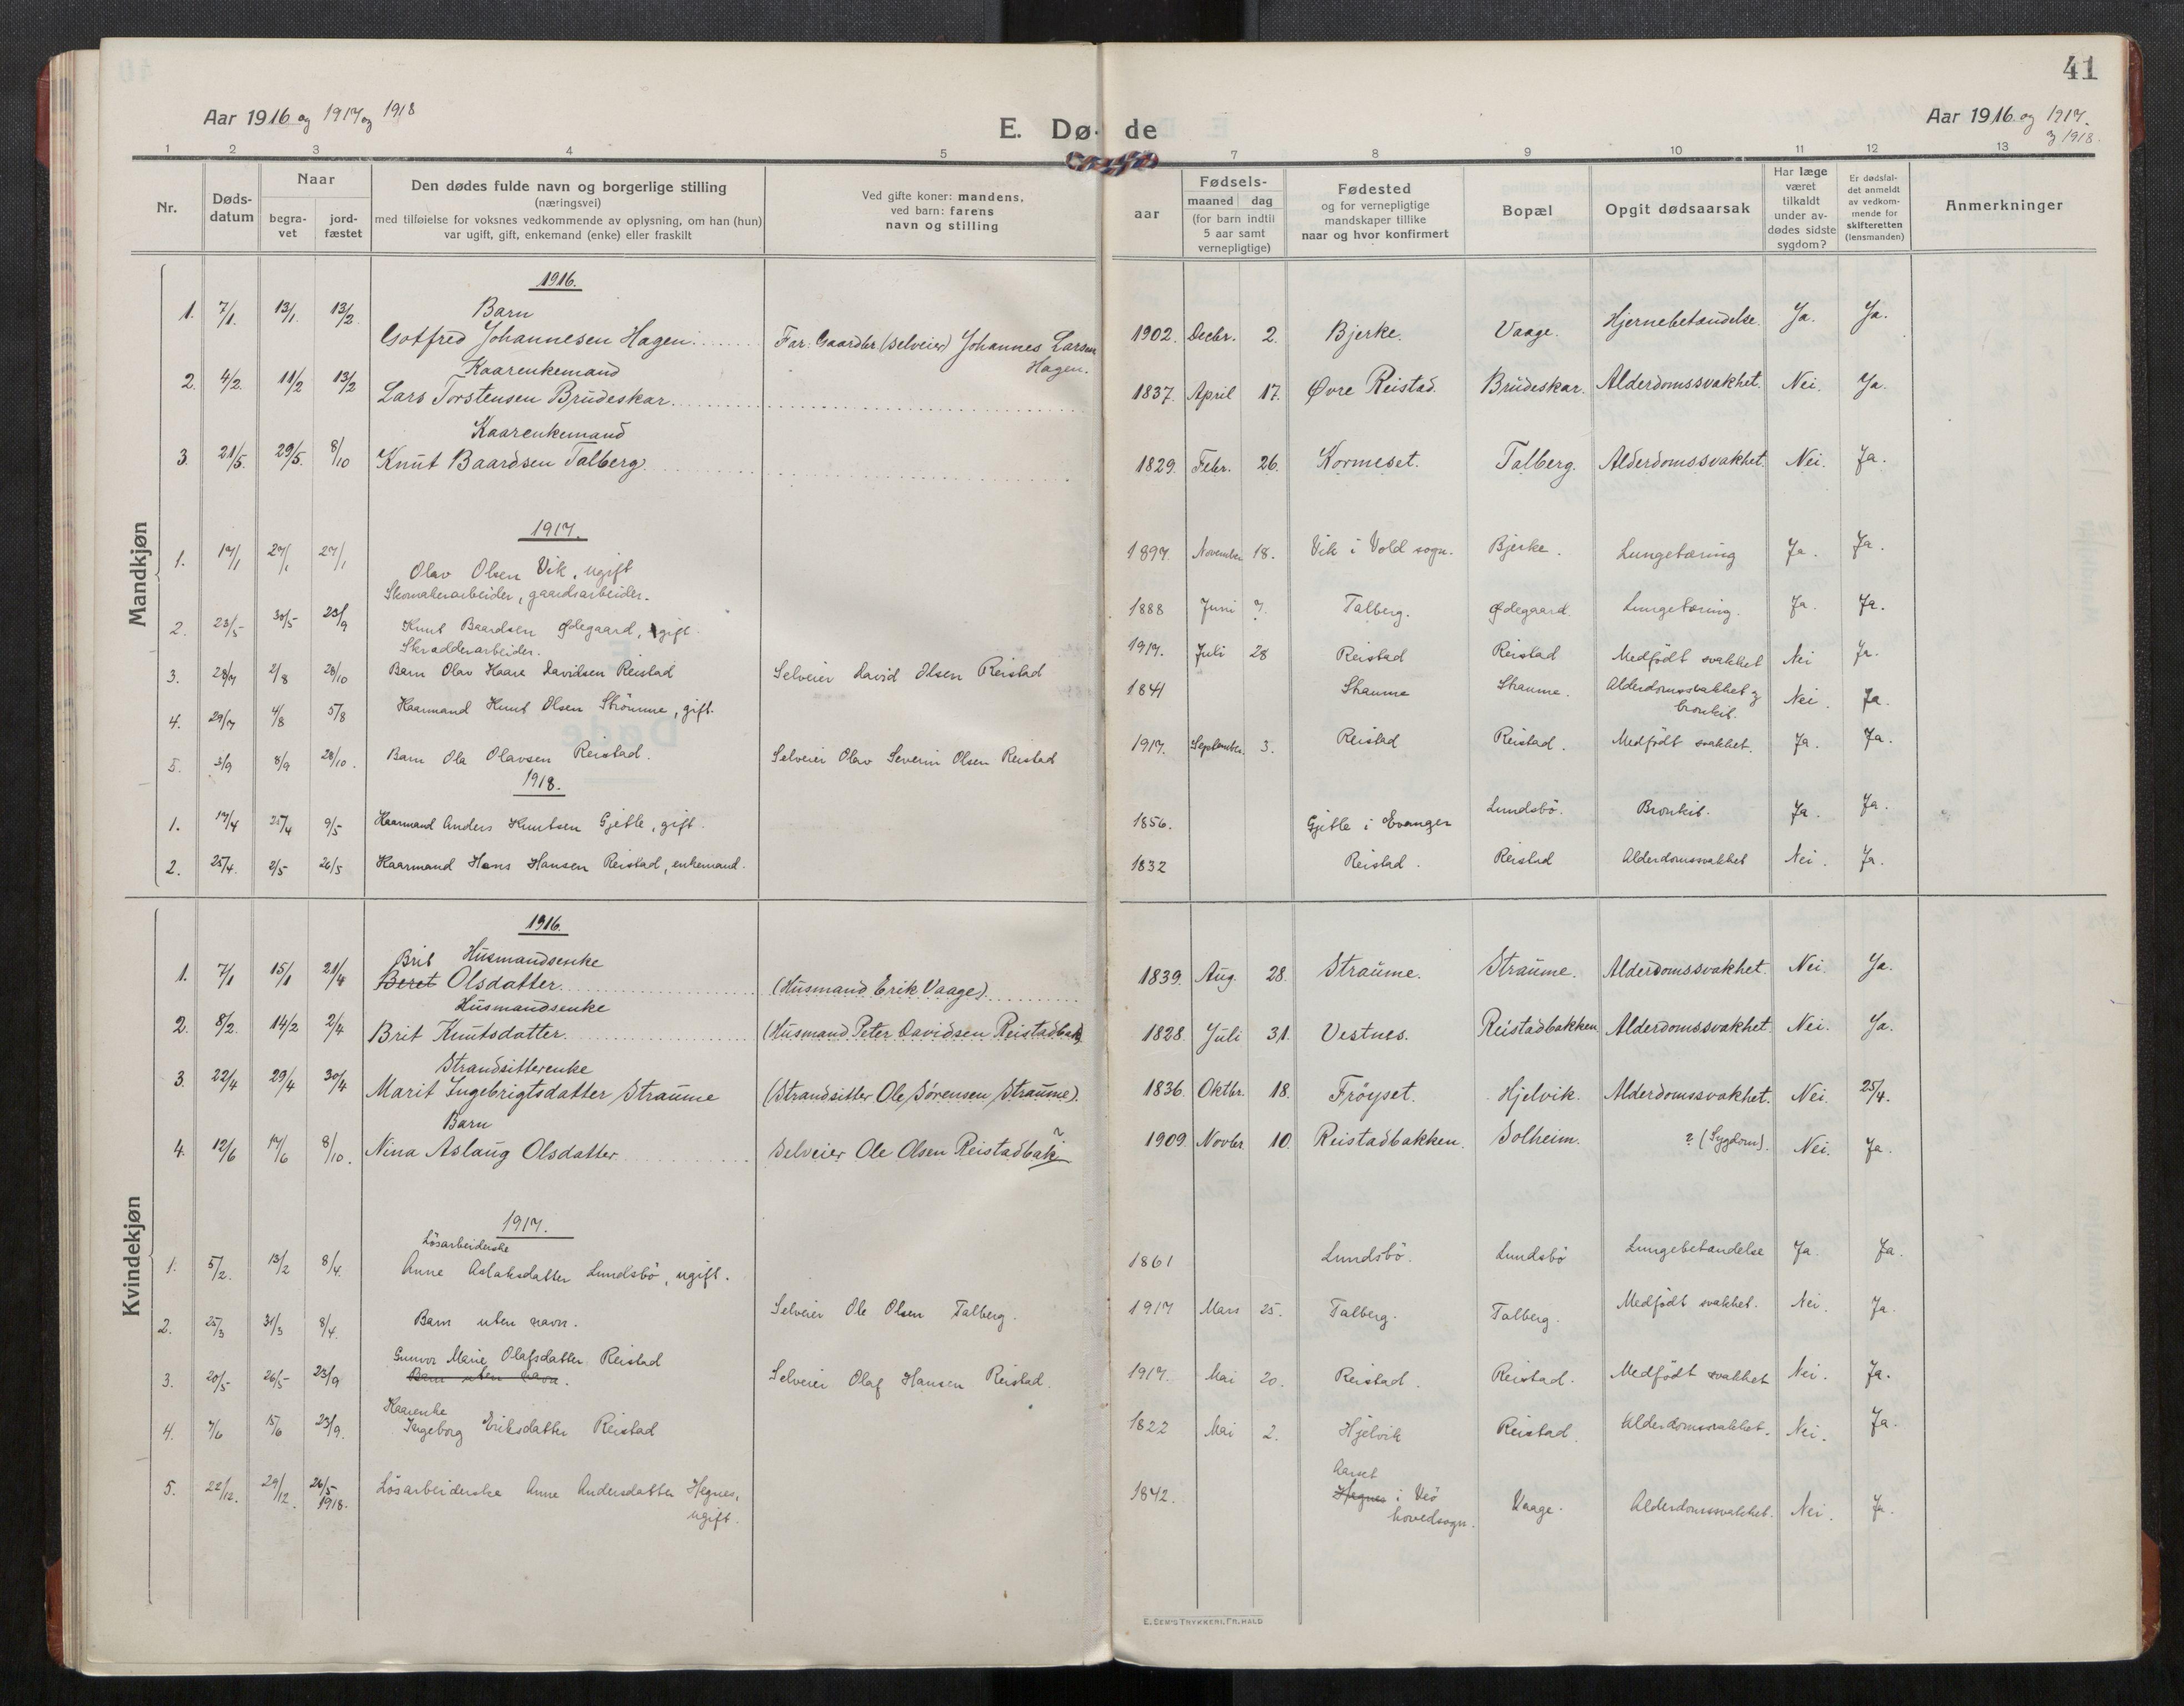 SAT, Grytten sokneprestkontor, Ministerialbok nr. 550A02, 1916-1931, s. 41